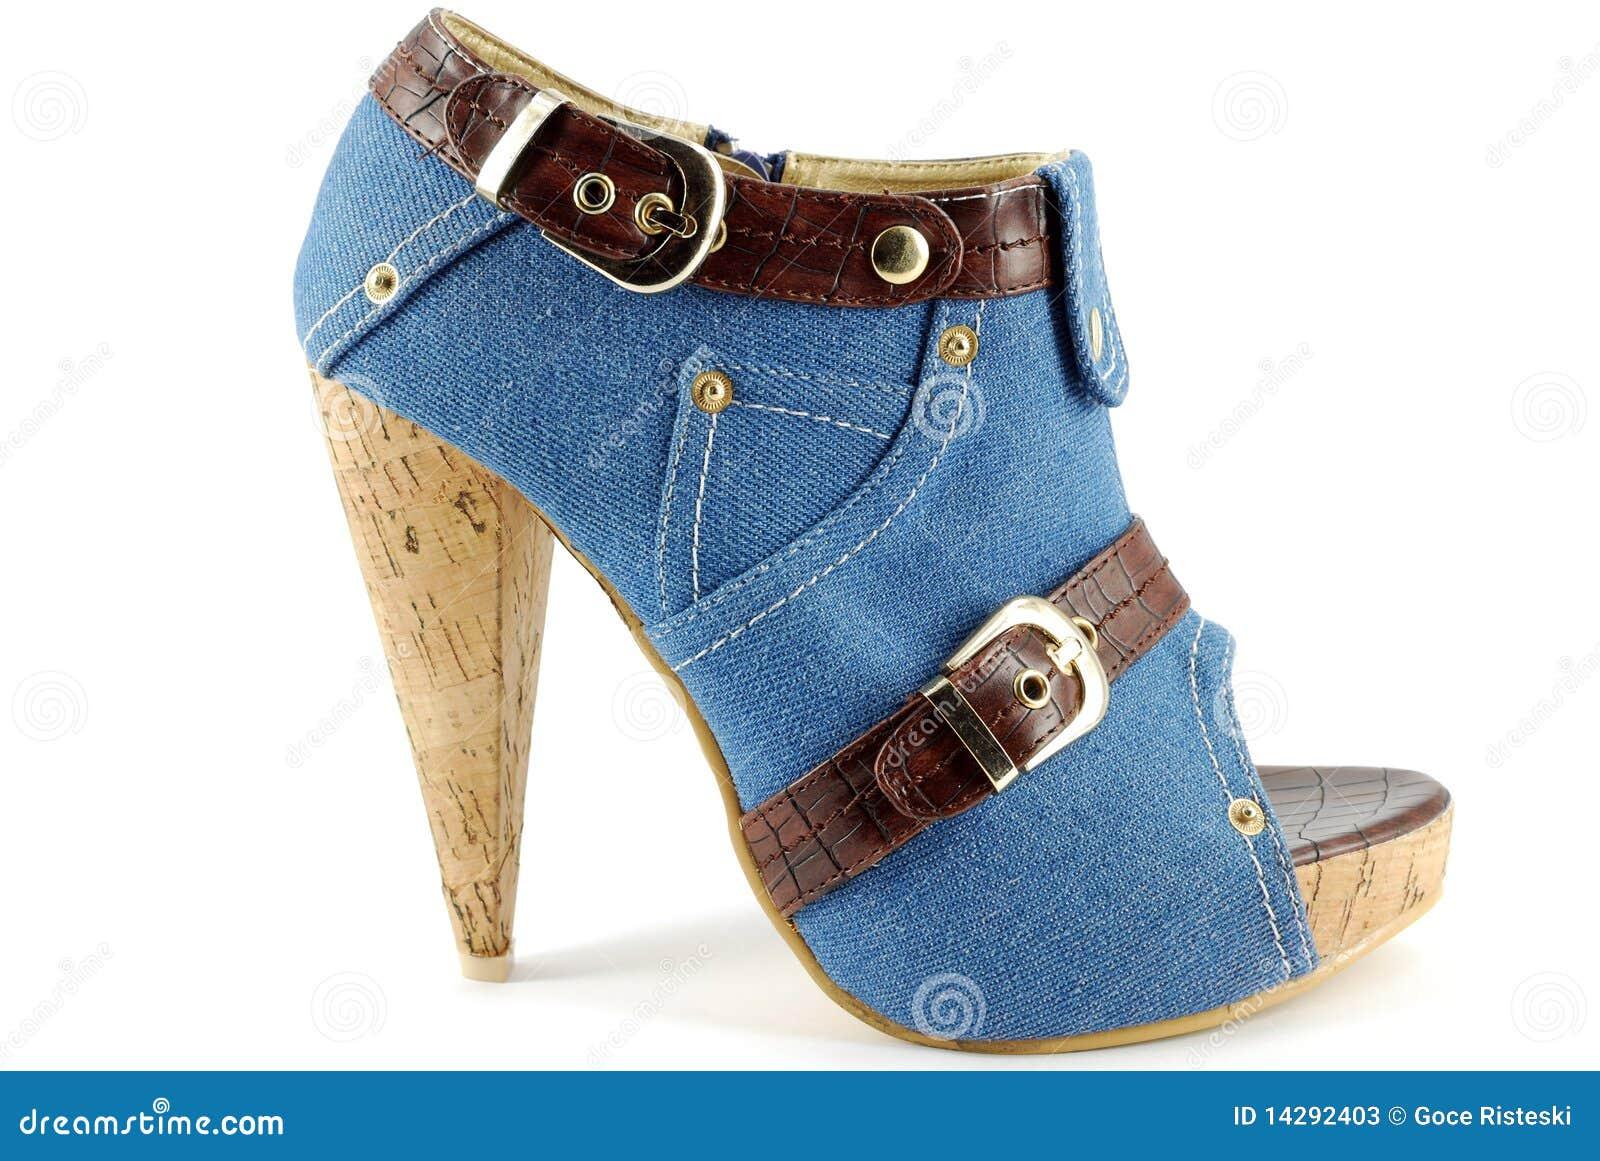 a101e7283c0c8 Rfxrp7f1 Mujer Zapatos Zapatos Vaqueros Vaqueros It4qXwxx